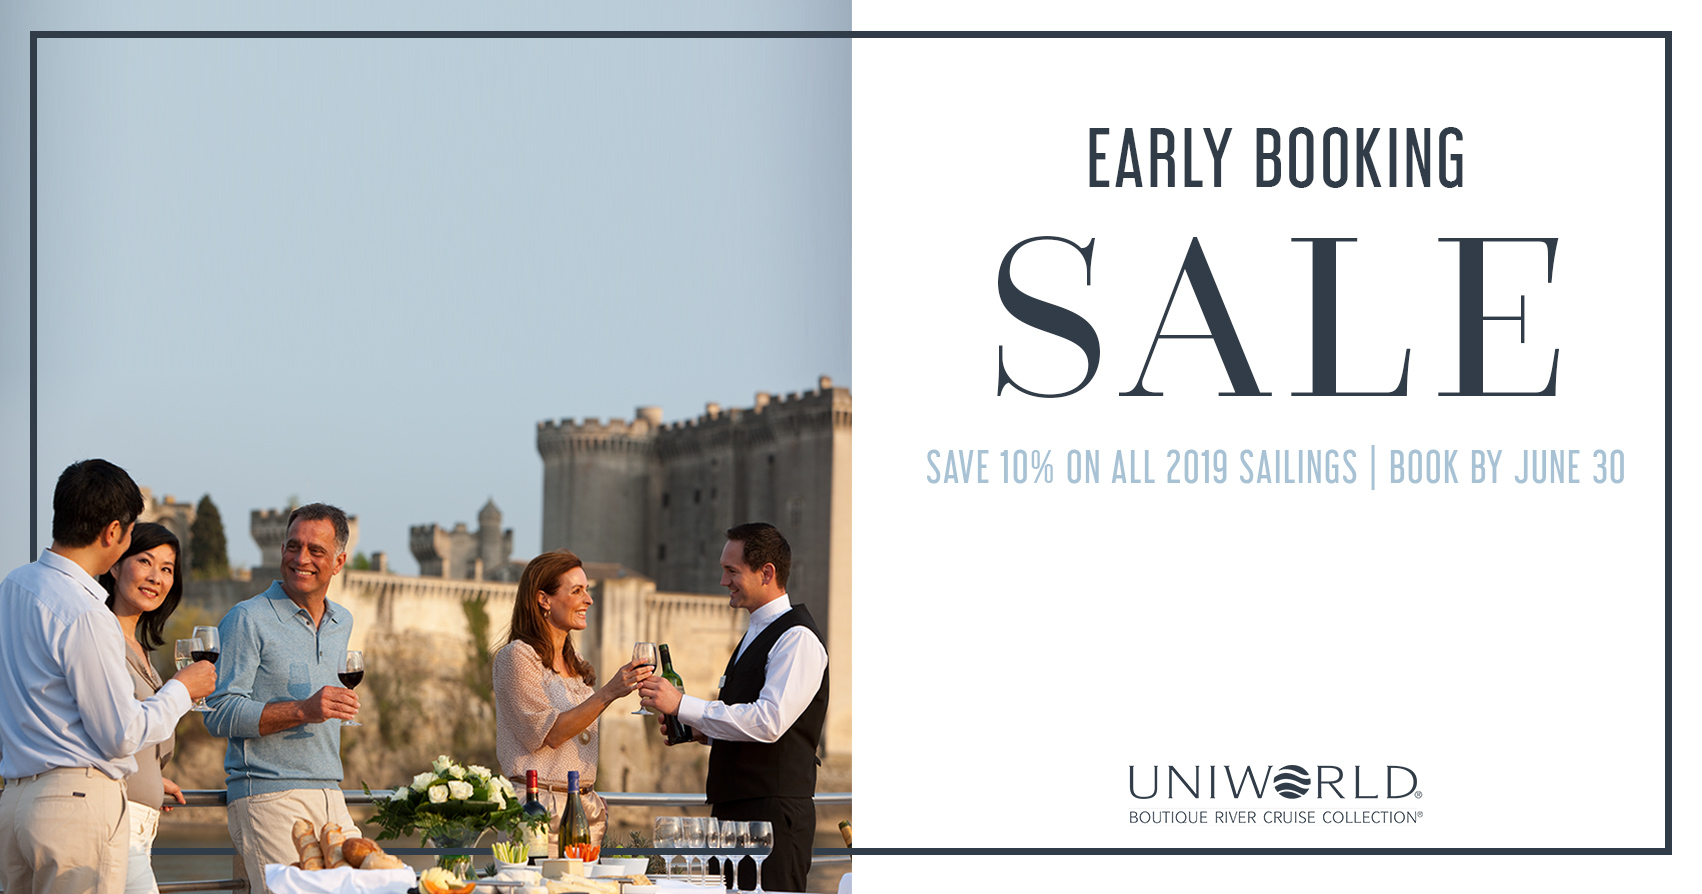 Uniworld – Up to 10% Savings